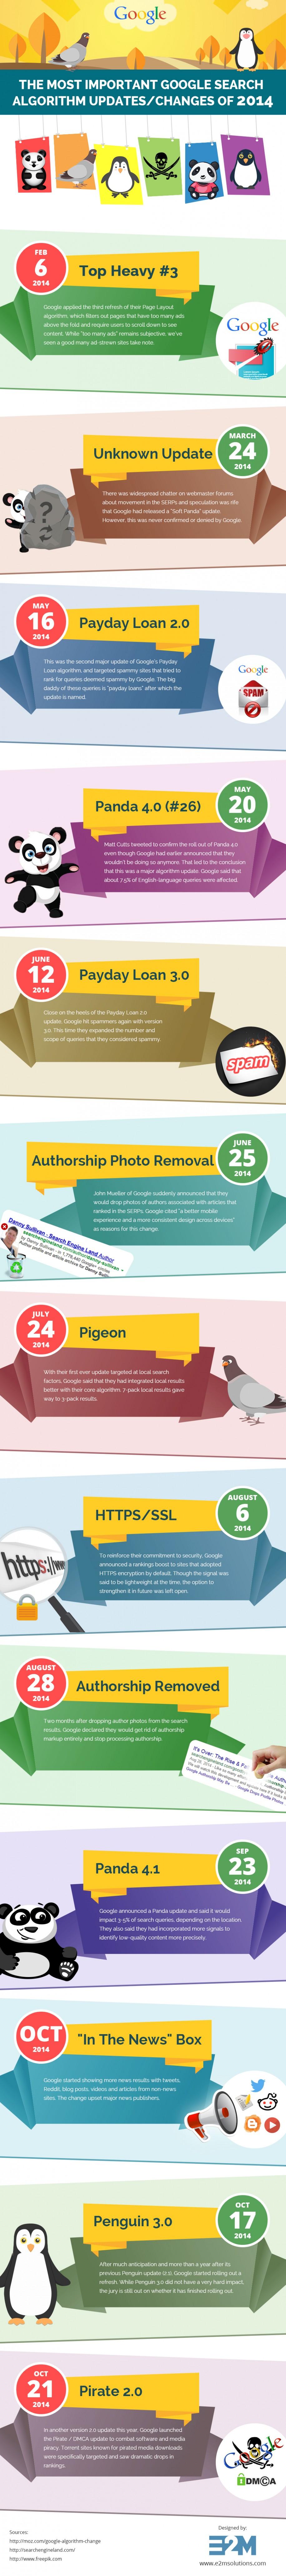 Infografik Google-Updates 2014